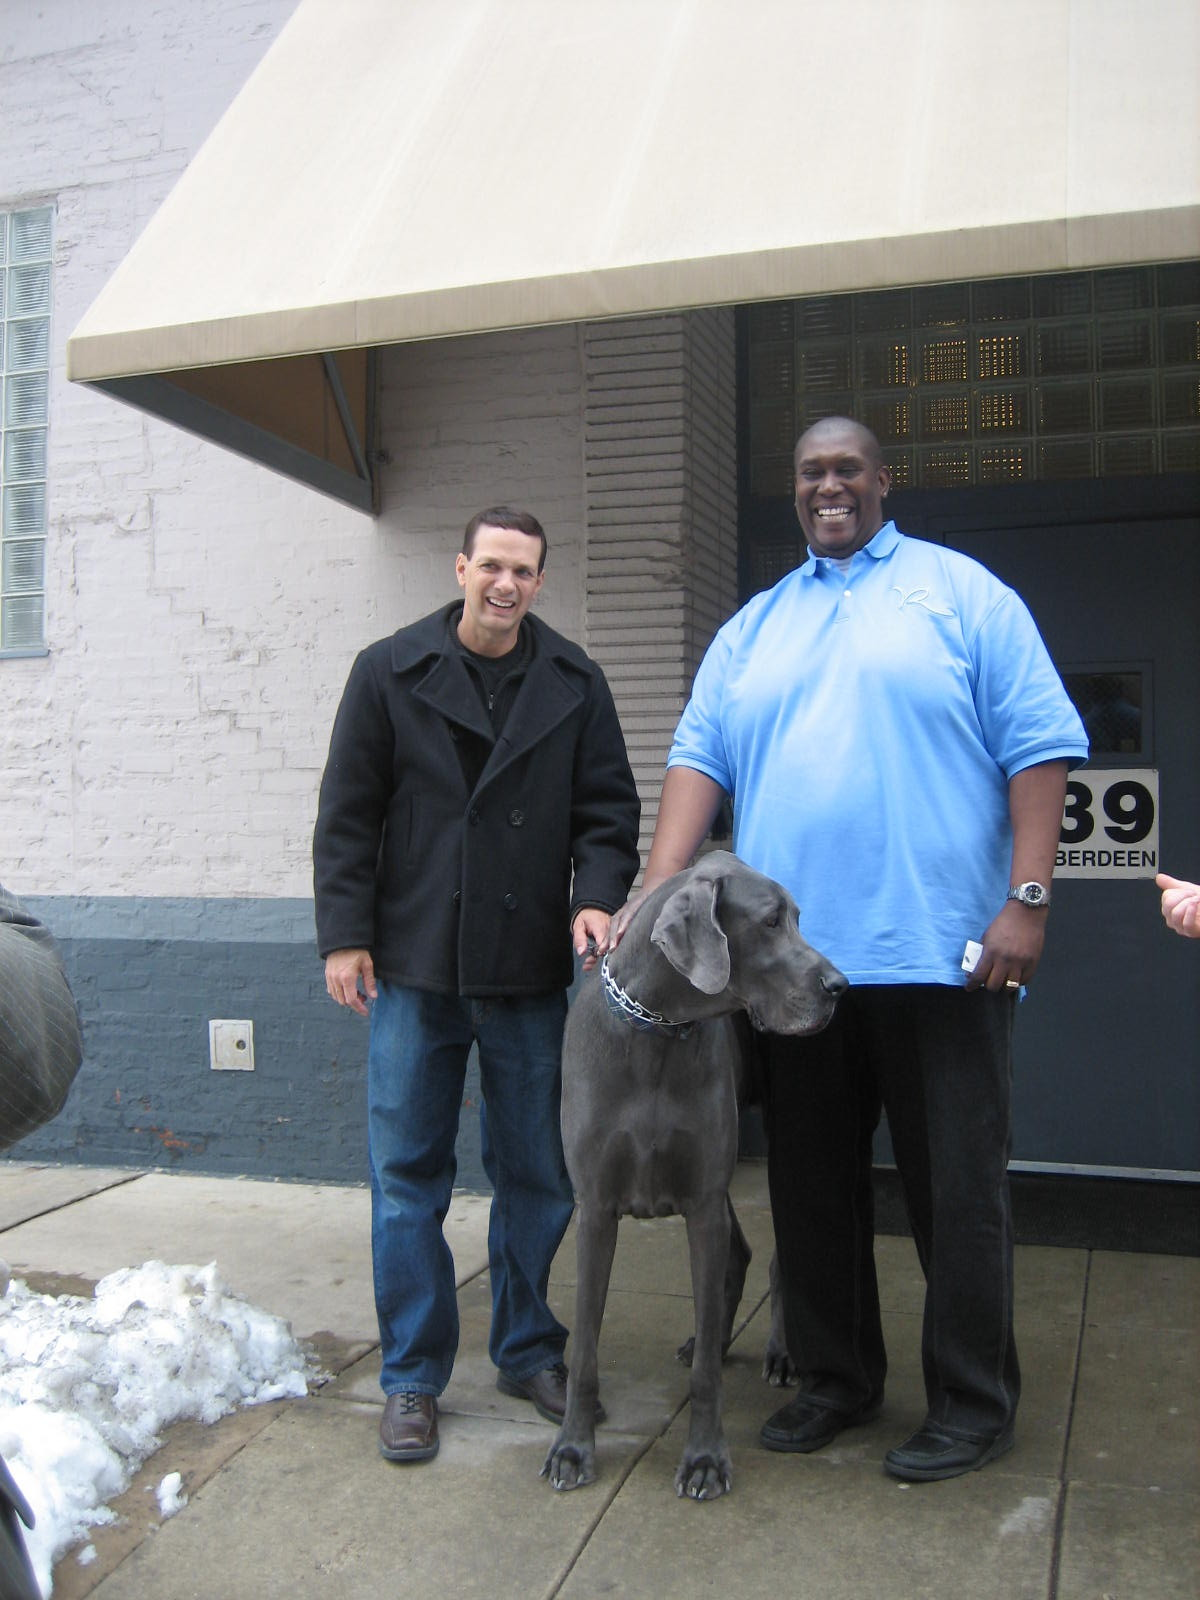 George with one of Oprah's HUGE bodyguards, Chicago Harpo Studios